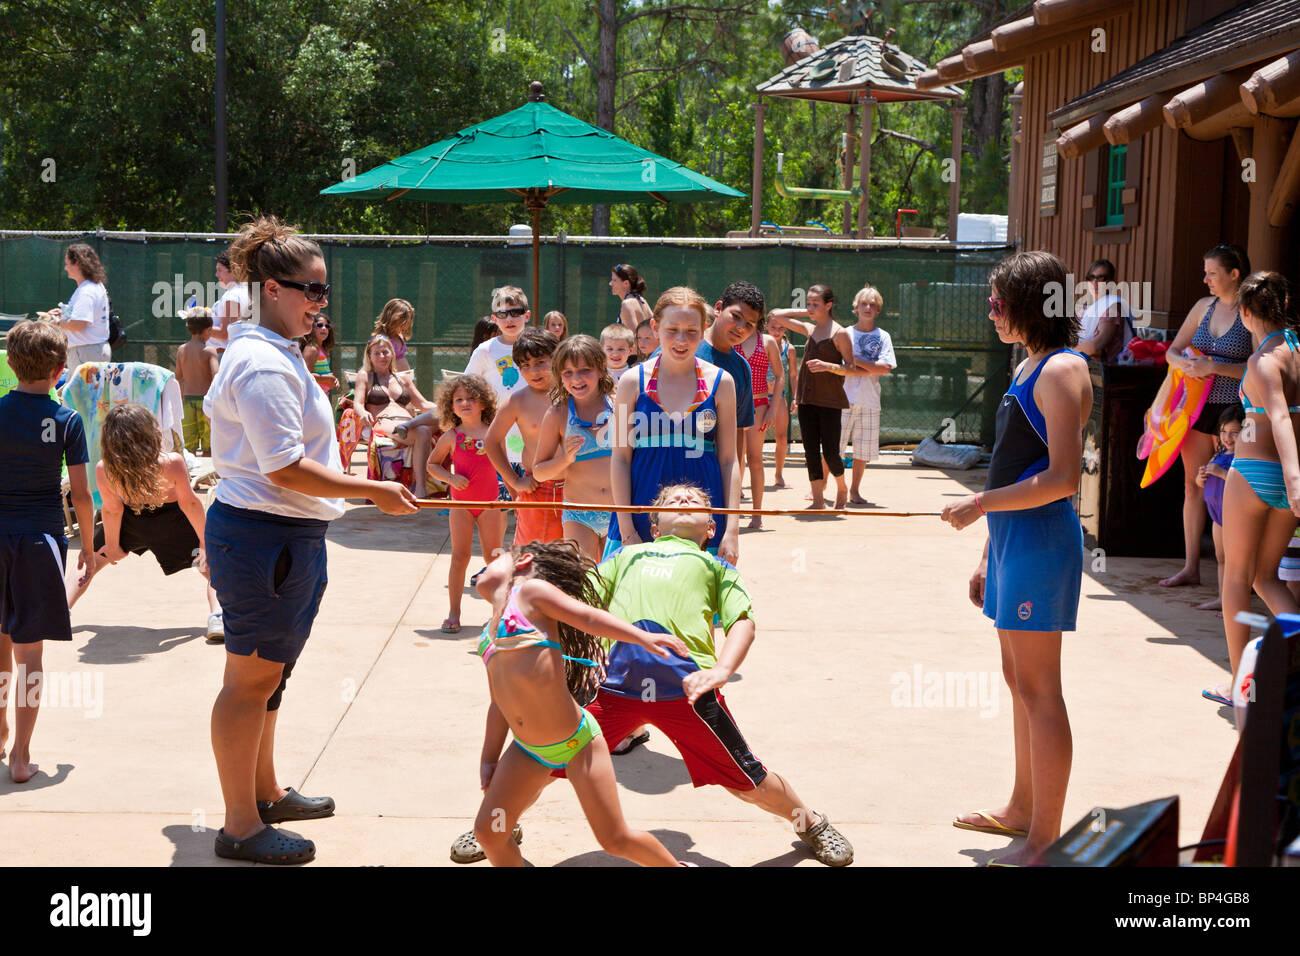 Walt Disney World, FL - May 2009 - Children compete in Limbo contest at Walt Disney's Fort Wilderness Resort - Stock Image